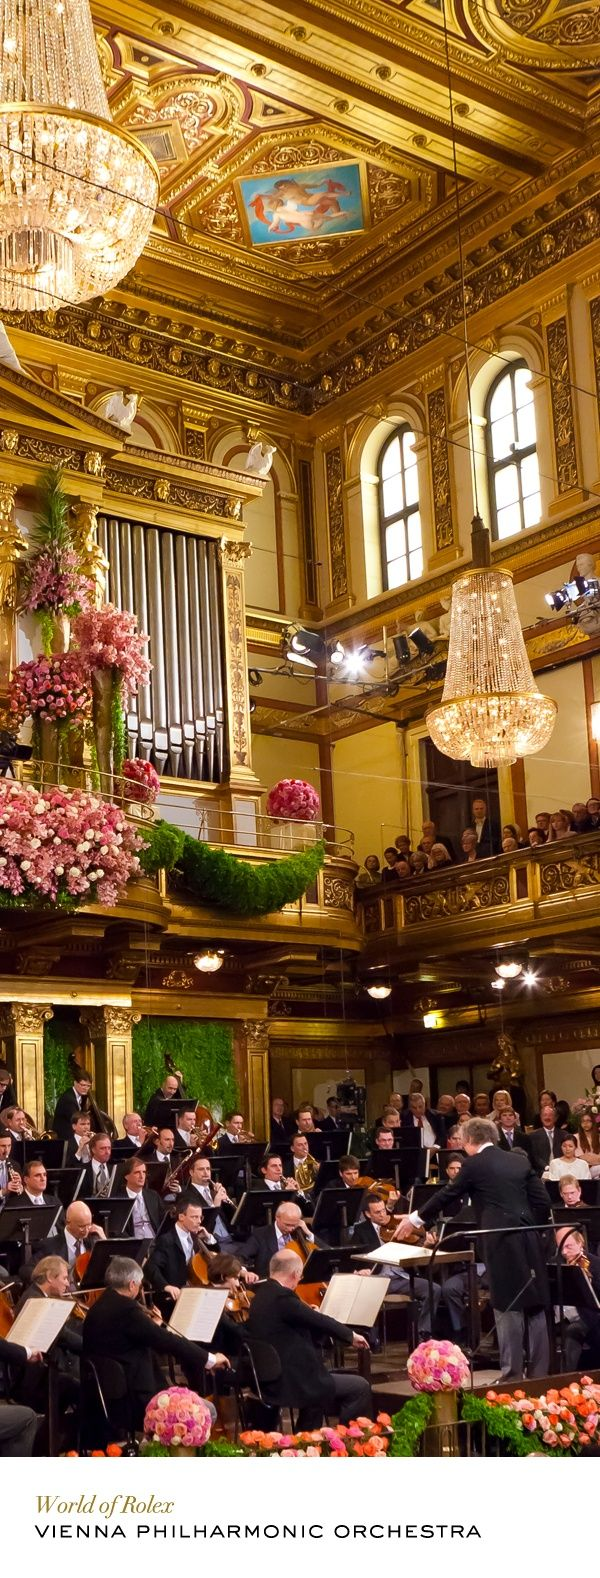 Vienna Philharmonic Orchestra, New Year's Concert, from Vienna, Austria via: